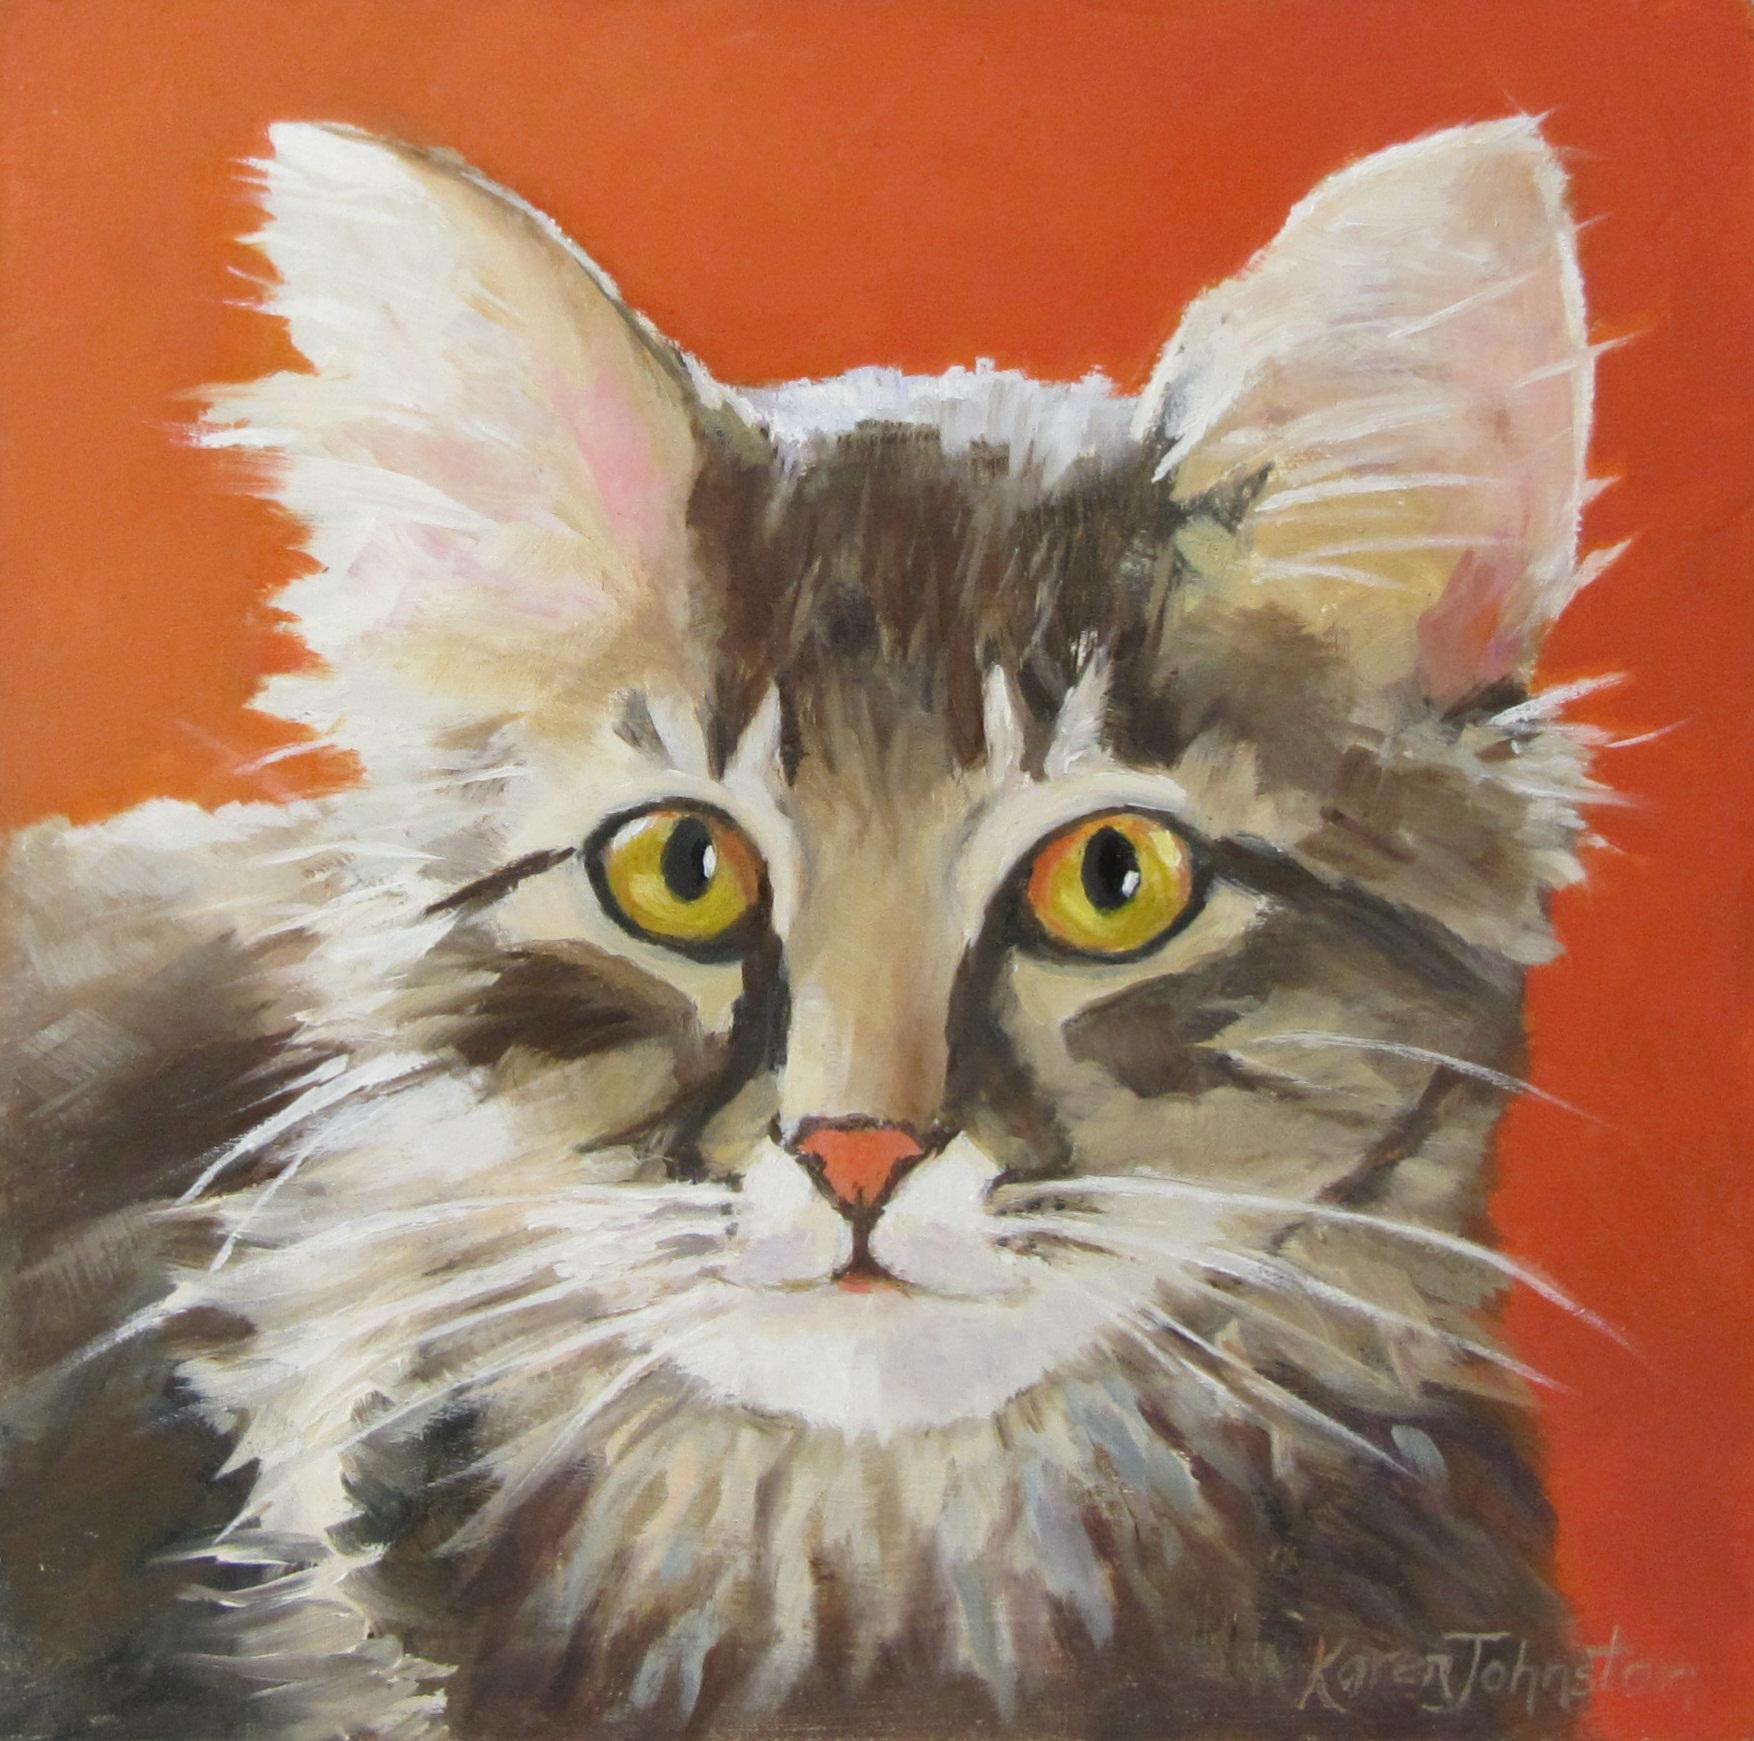 """Miss Kitty"" original fine art by Karen Johnston"